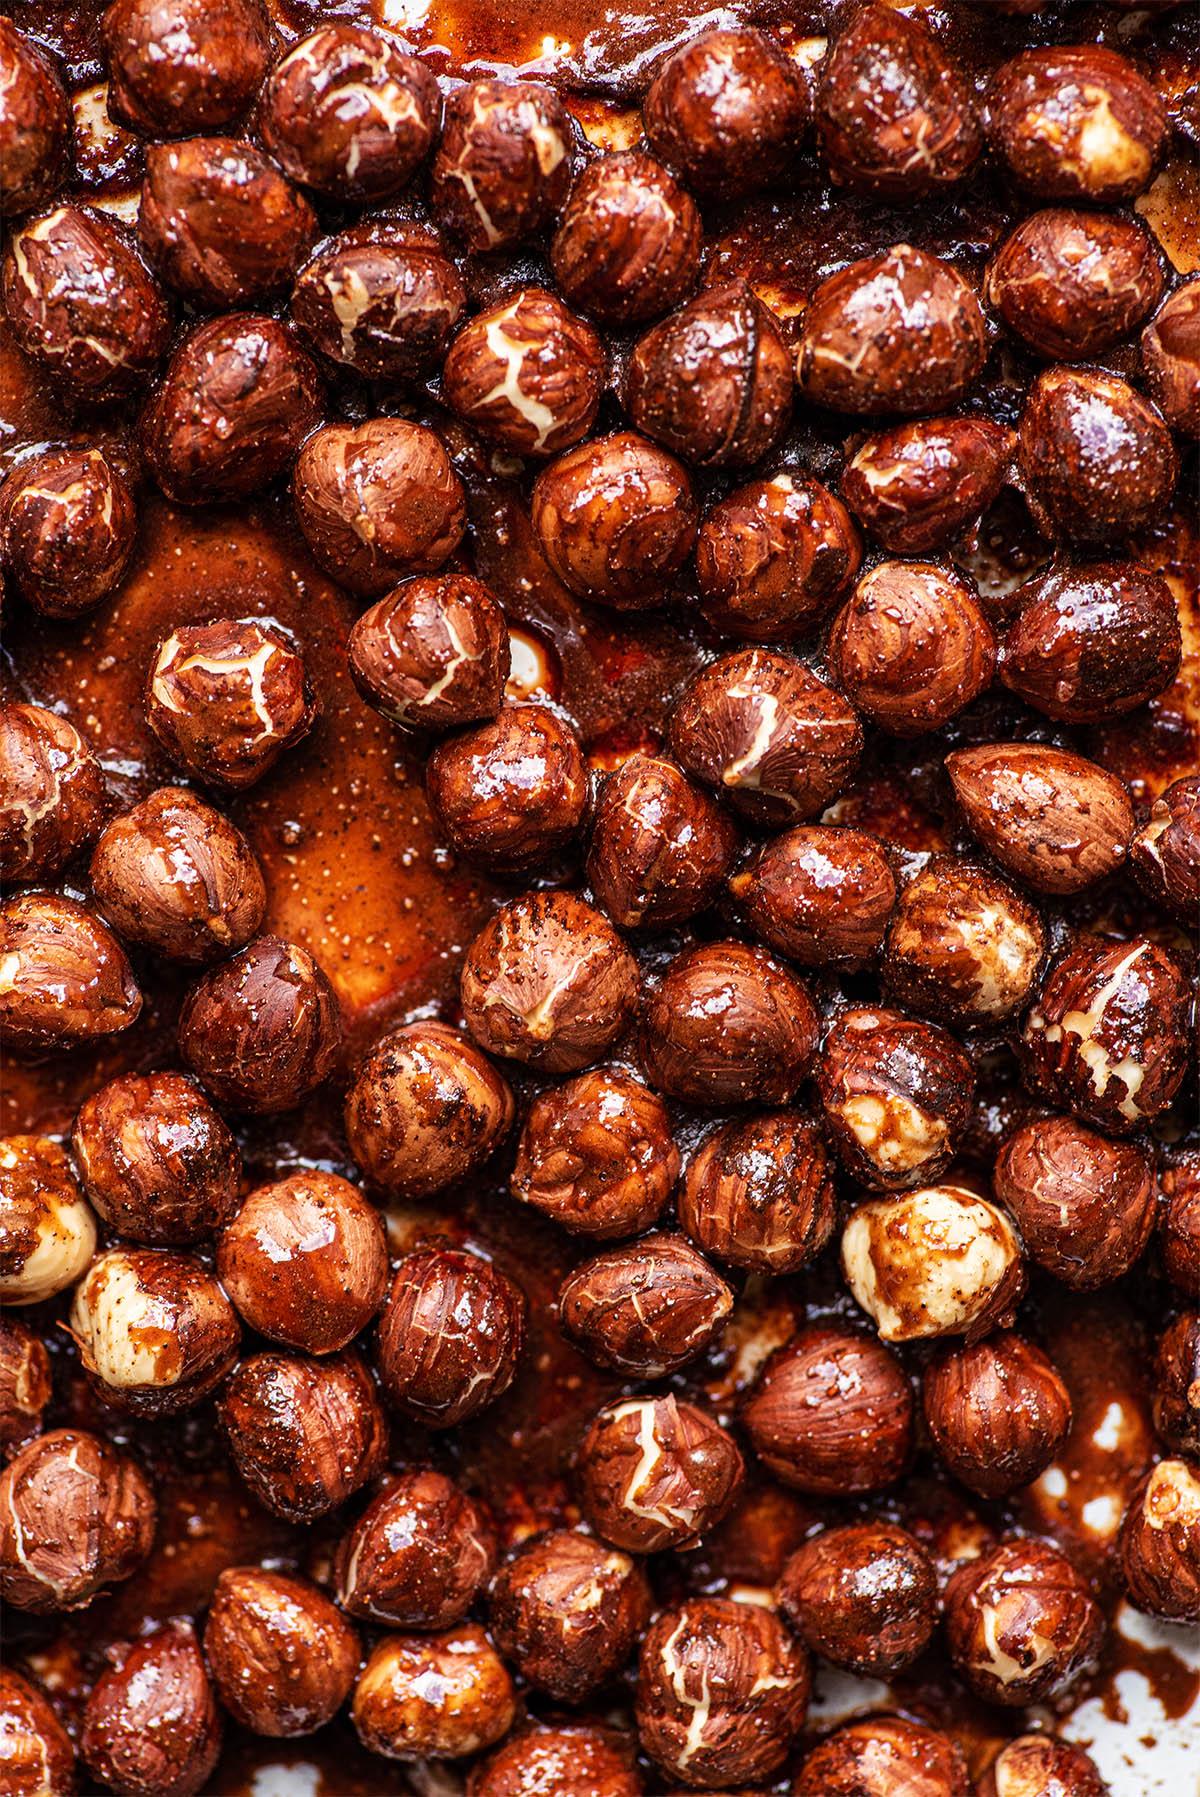 Roasted hazelnuts close up.